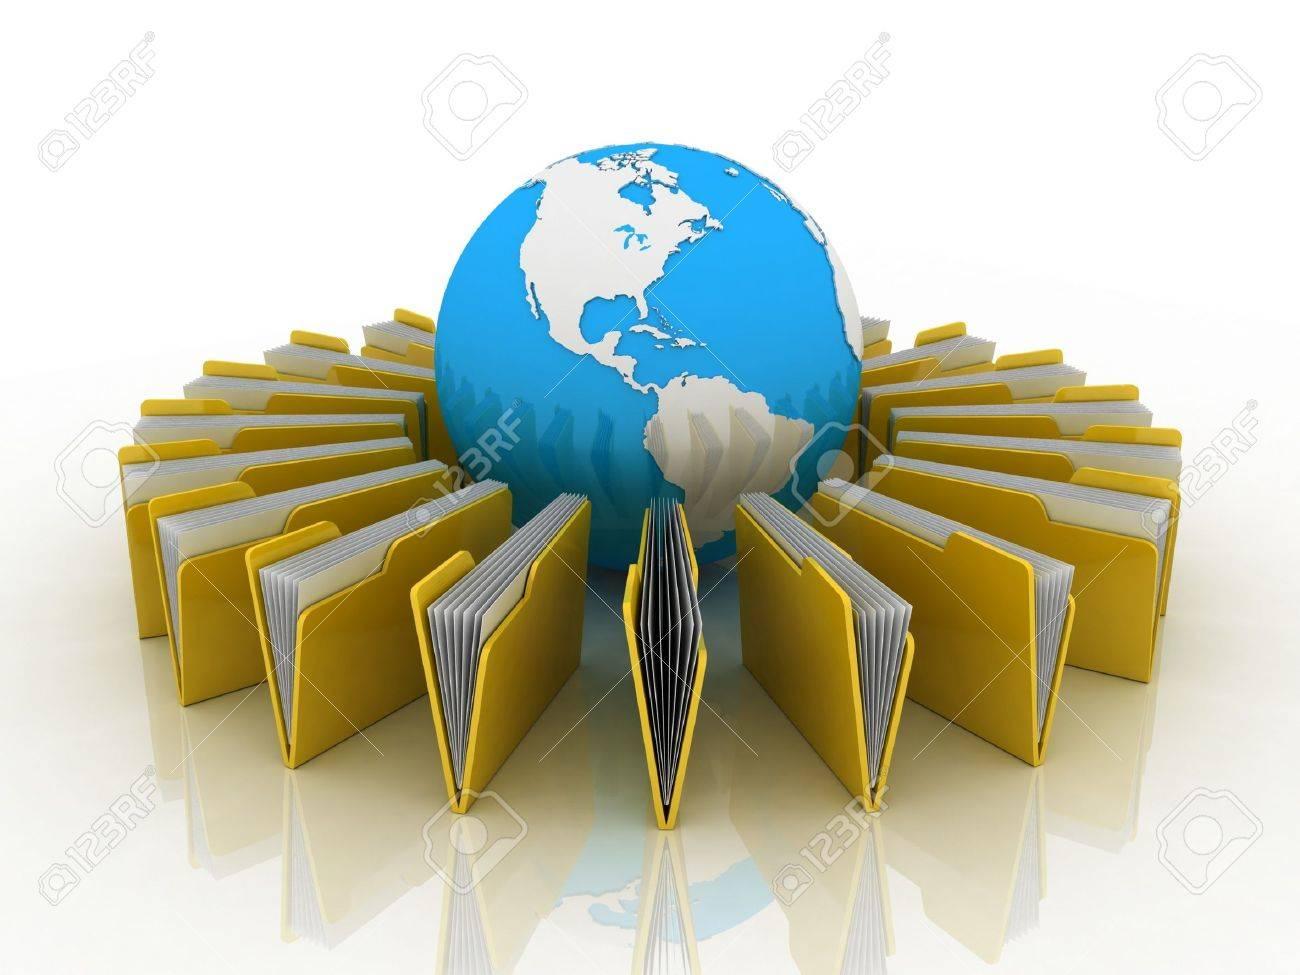 Transfer of documents. Forwarding files conceptual 3d illustration. Stock Illustration - 12115597